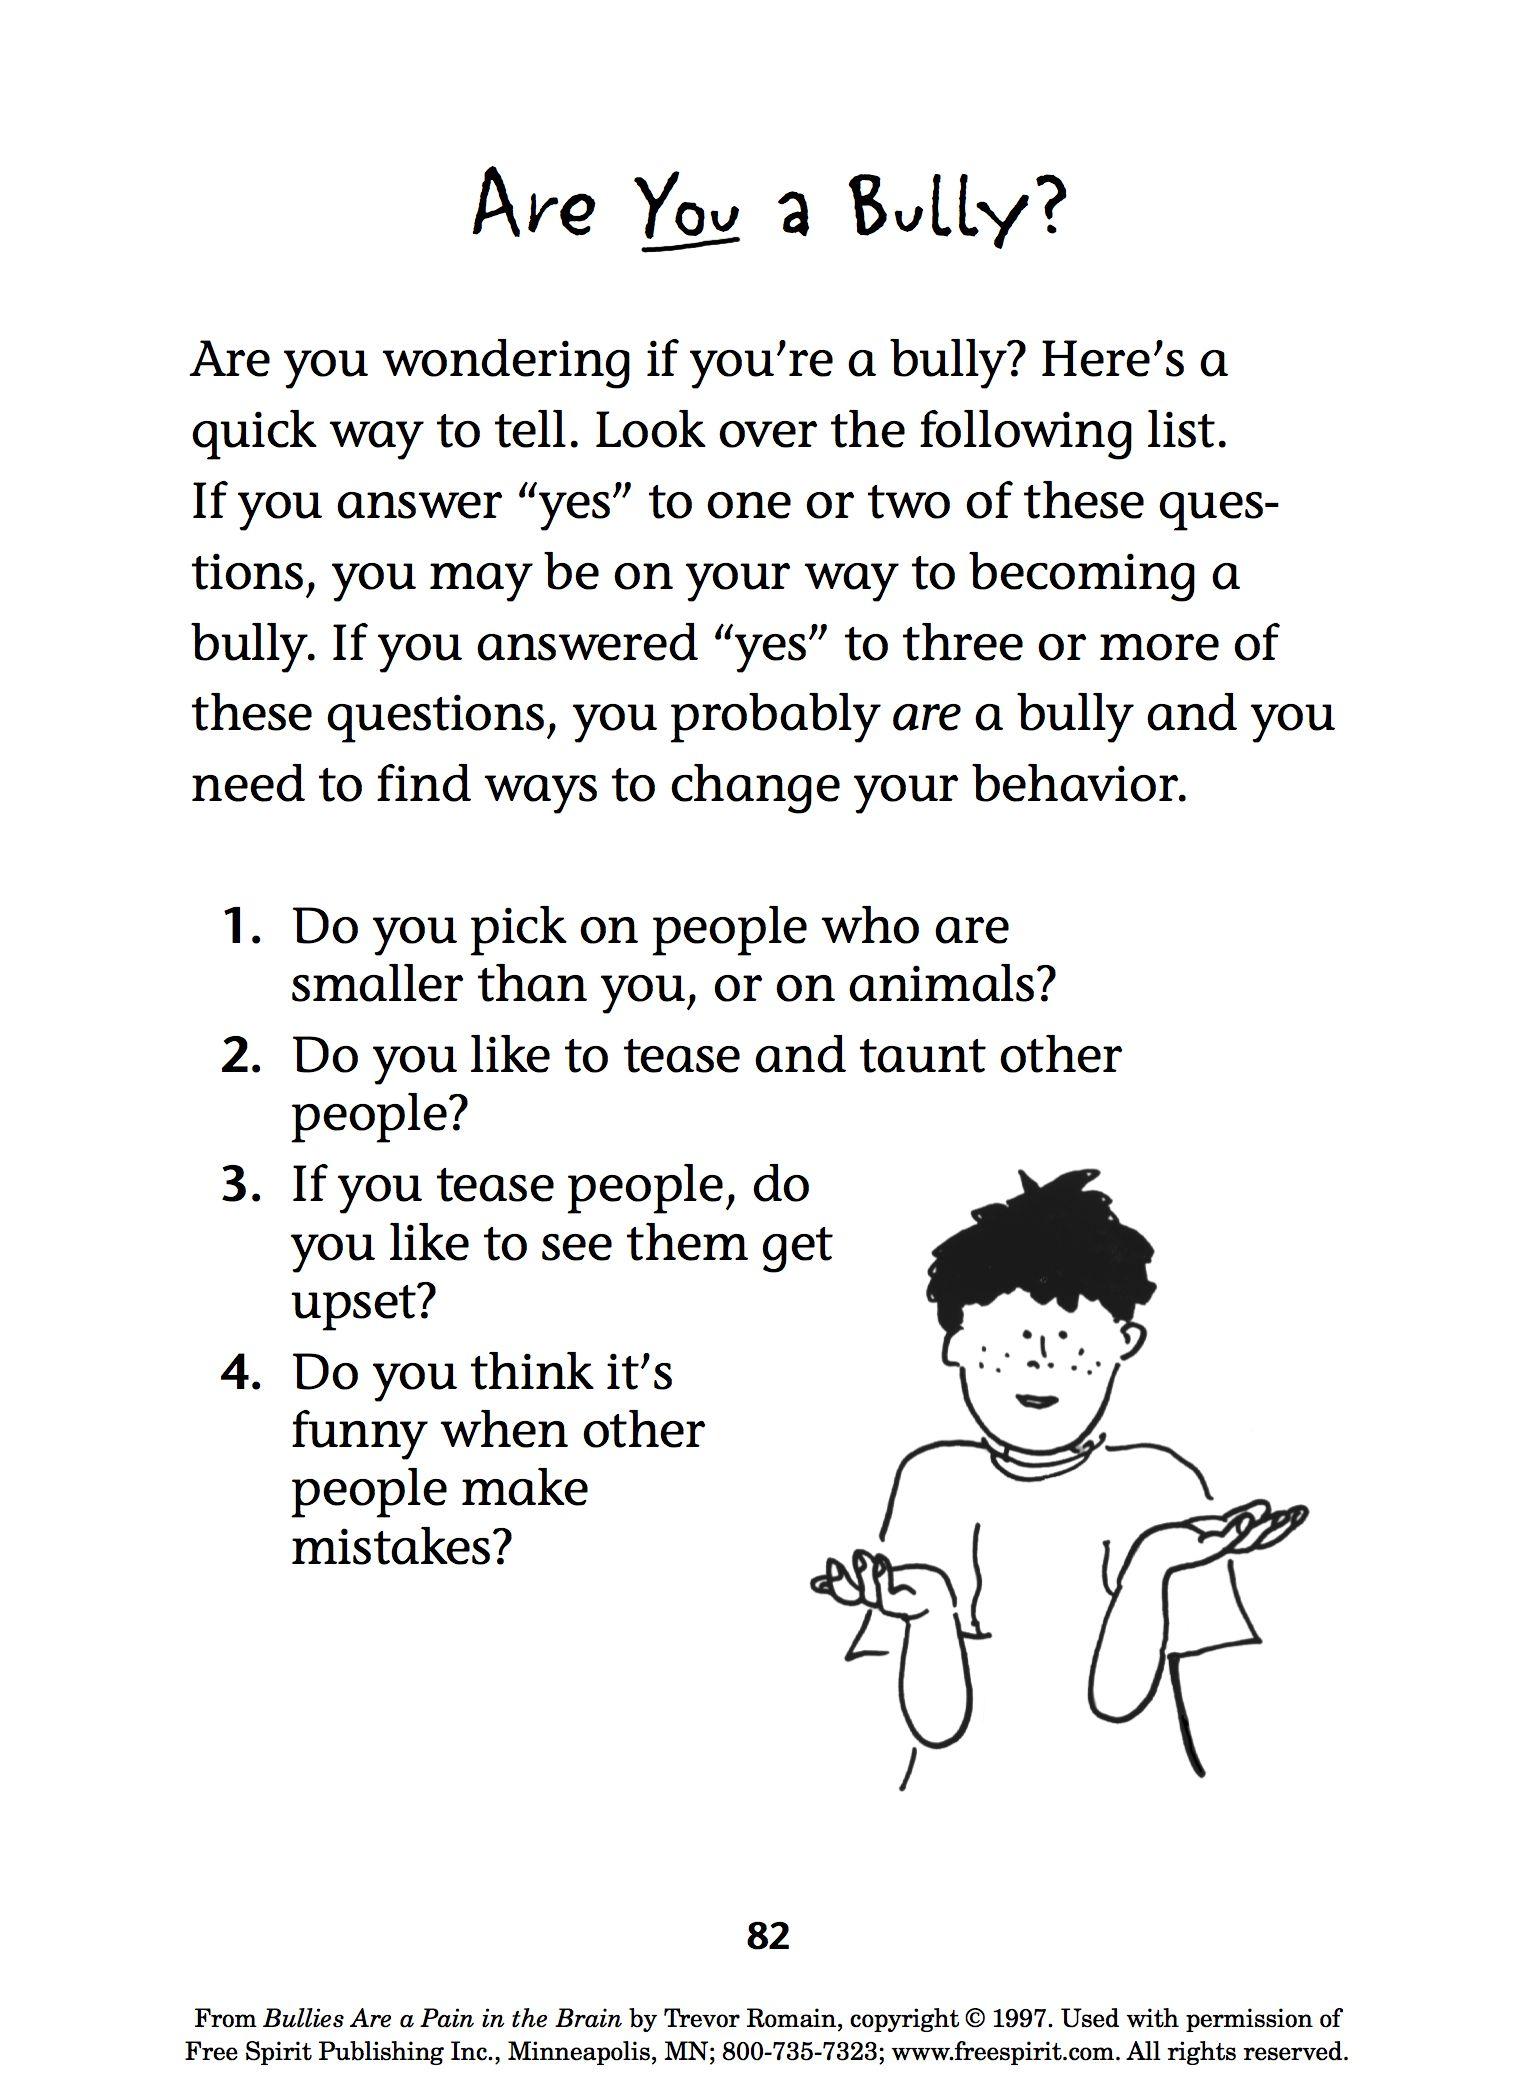 Free Bullying Prevention Printable Quiz For Teachers